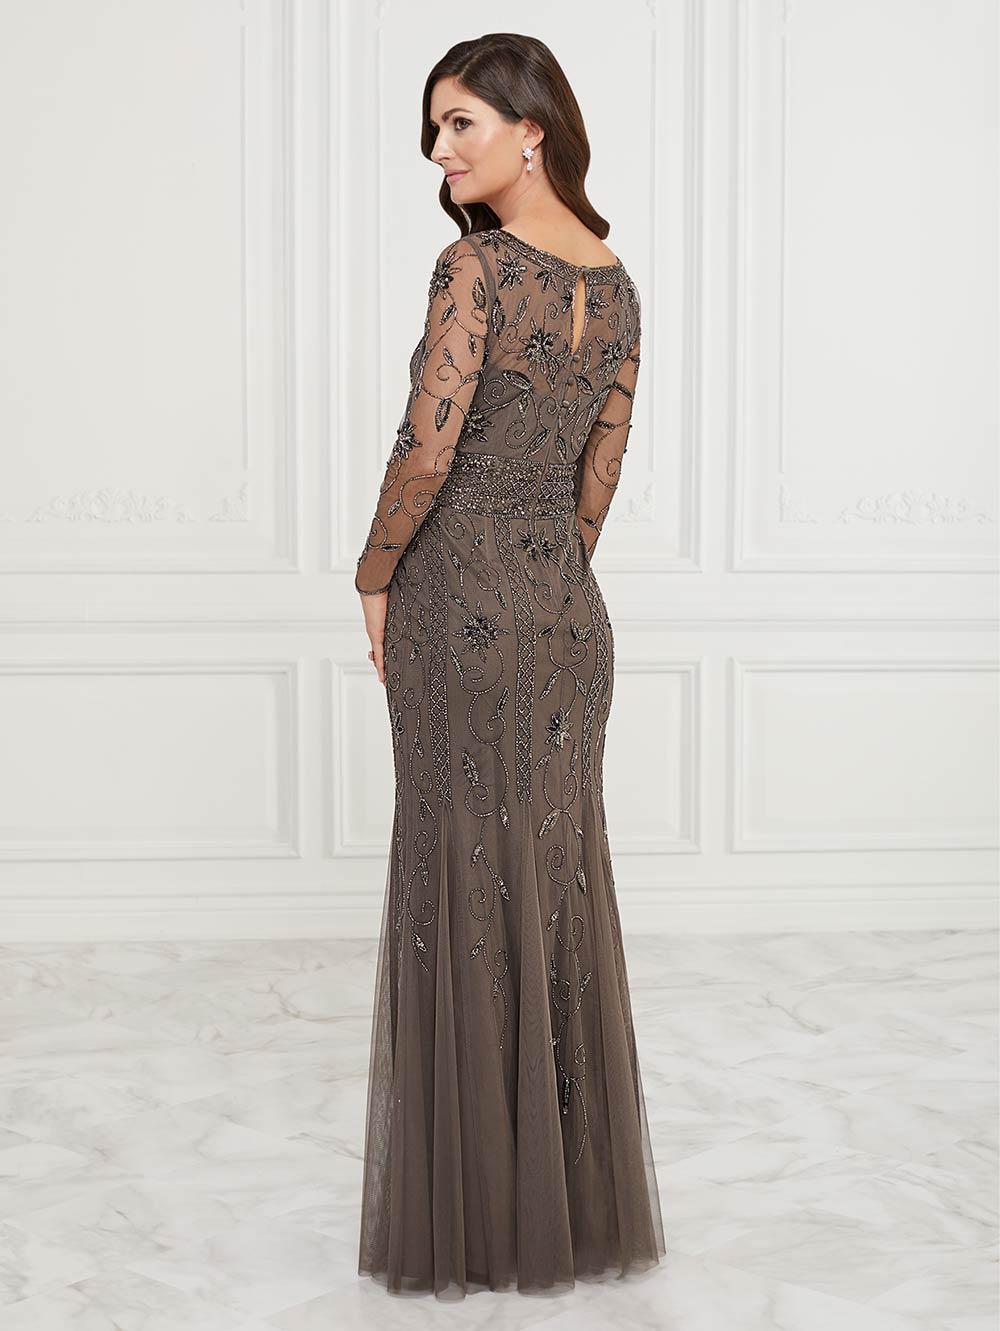 special-occasion-dresses-jacquelin-bridals-canada-27702